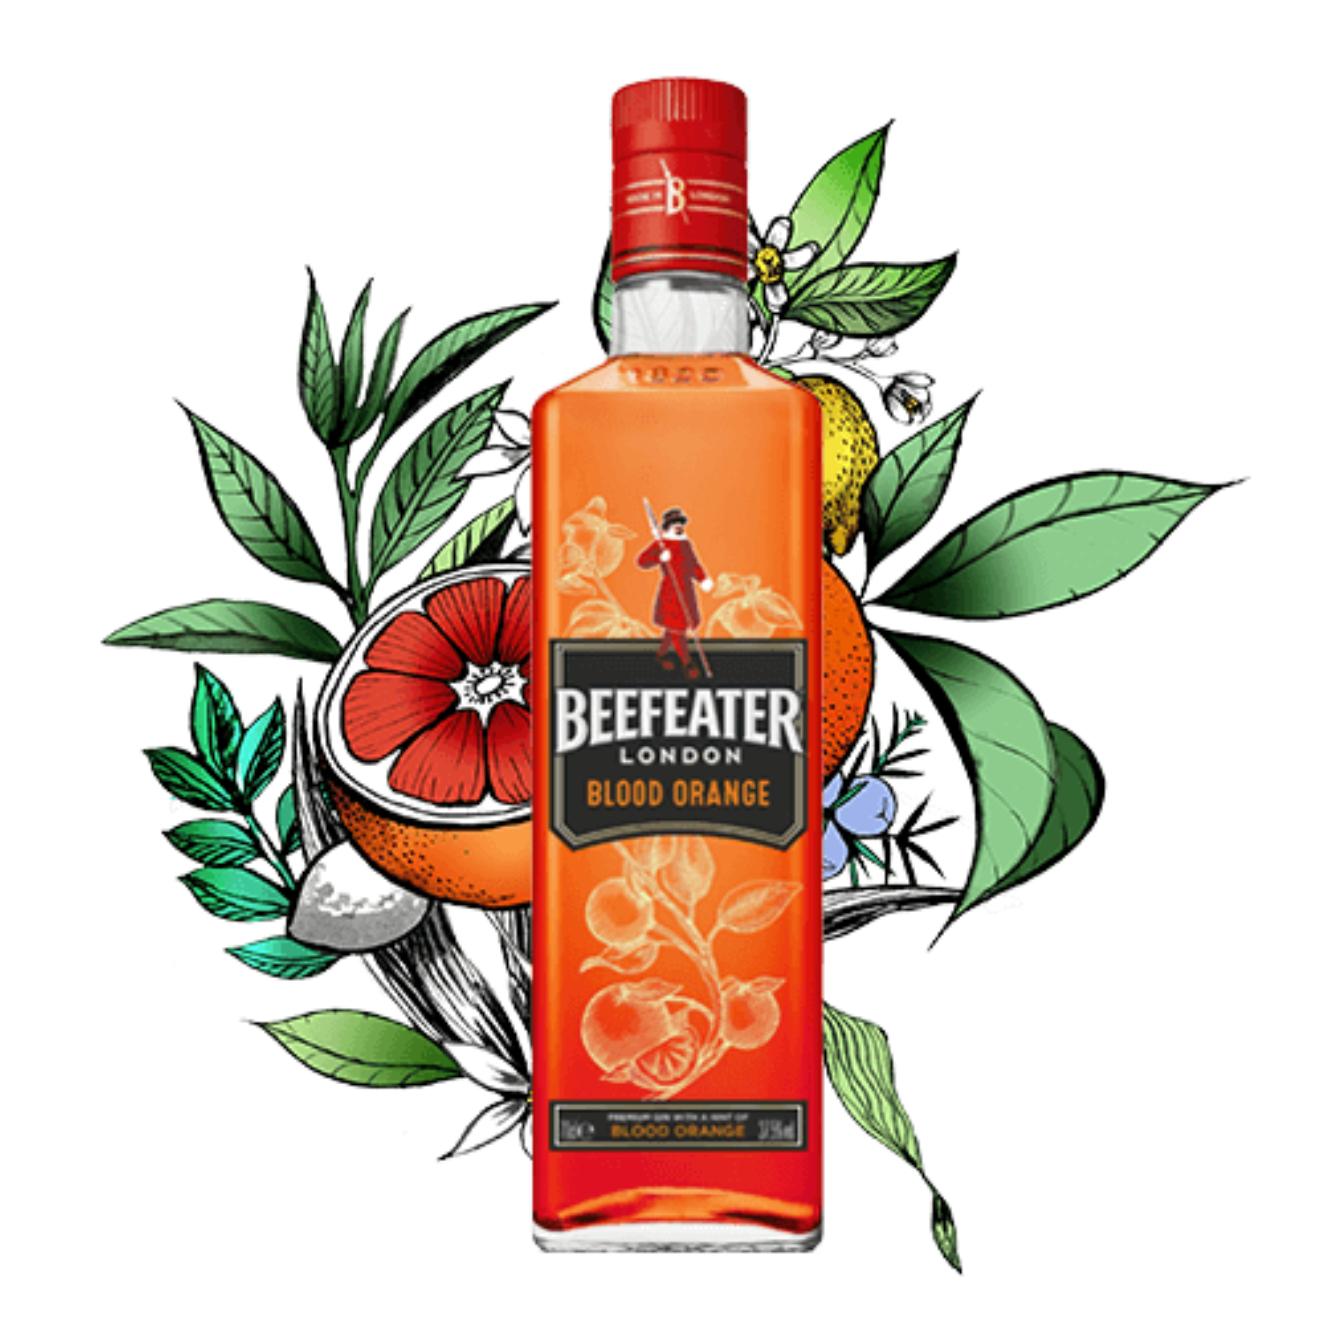 Beefeater Blood Orange Gin